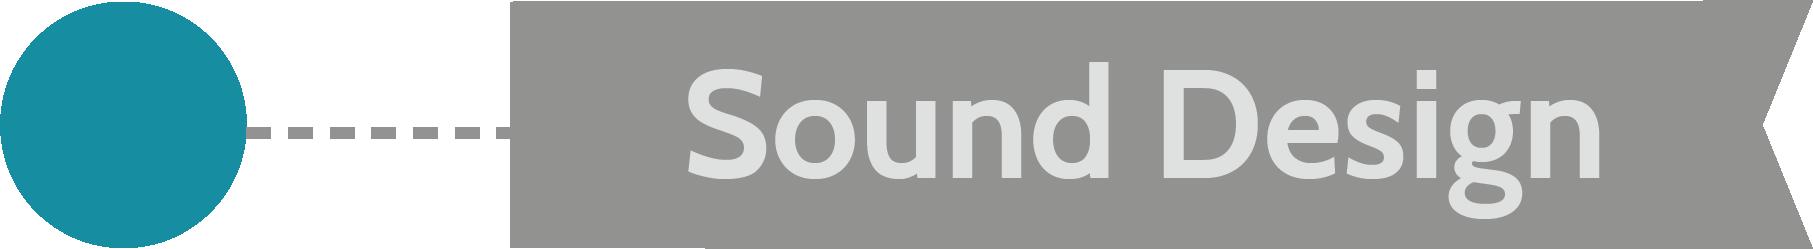 Sound-Design-Tag.png